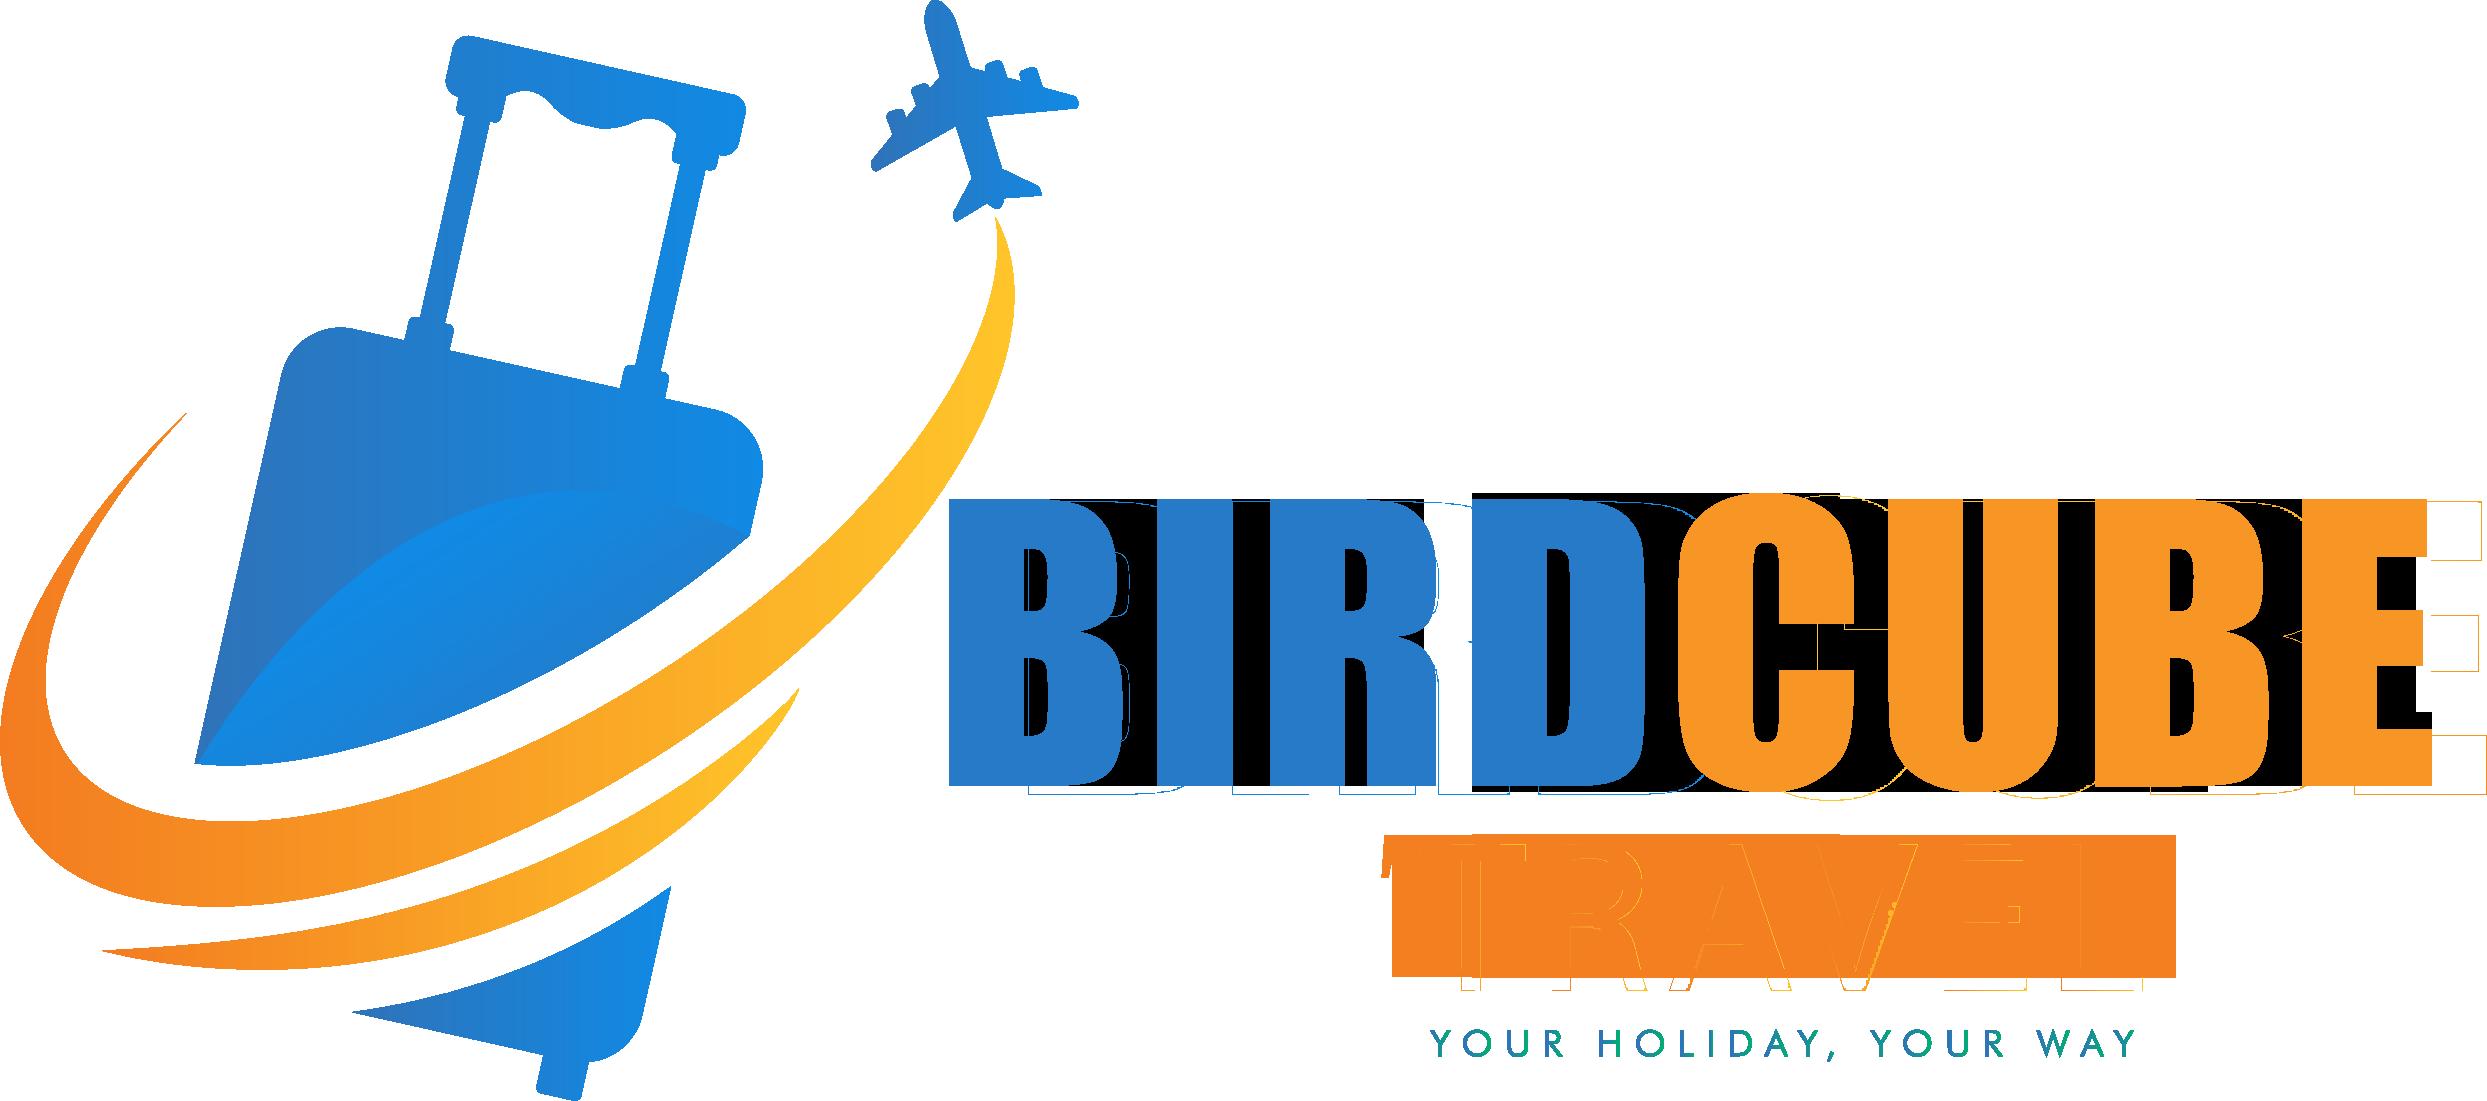 Birdcube Travel - Delhi Image